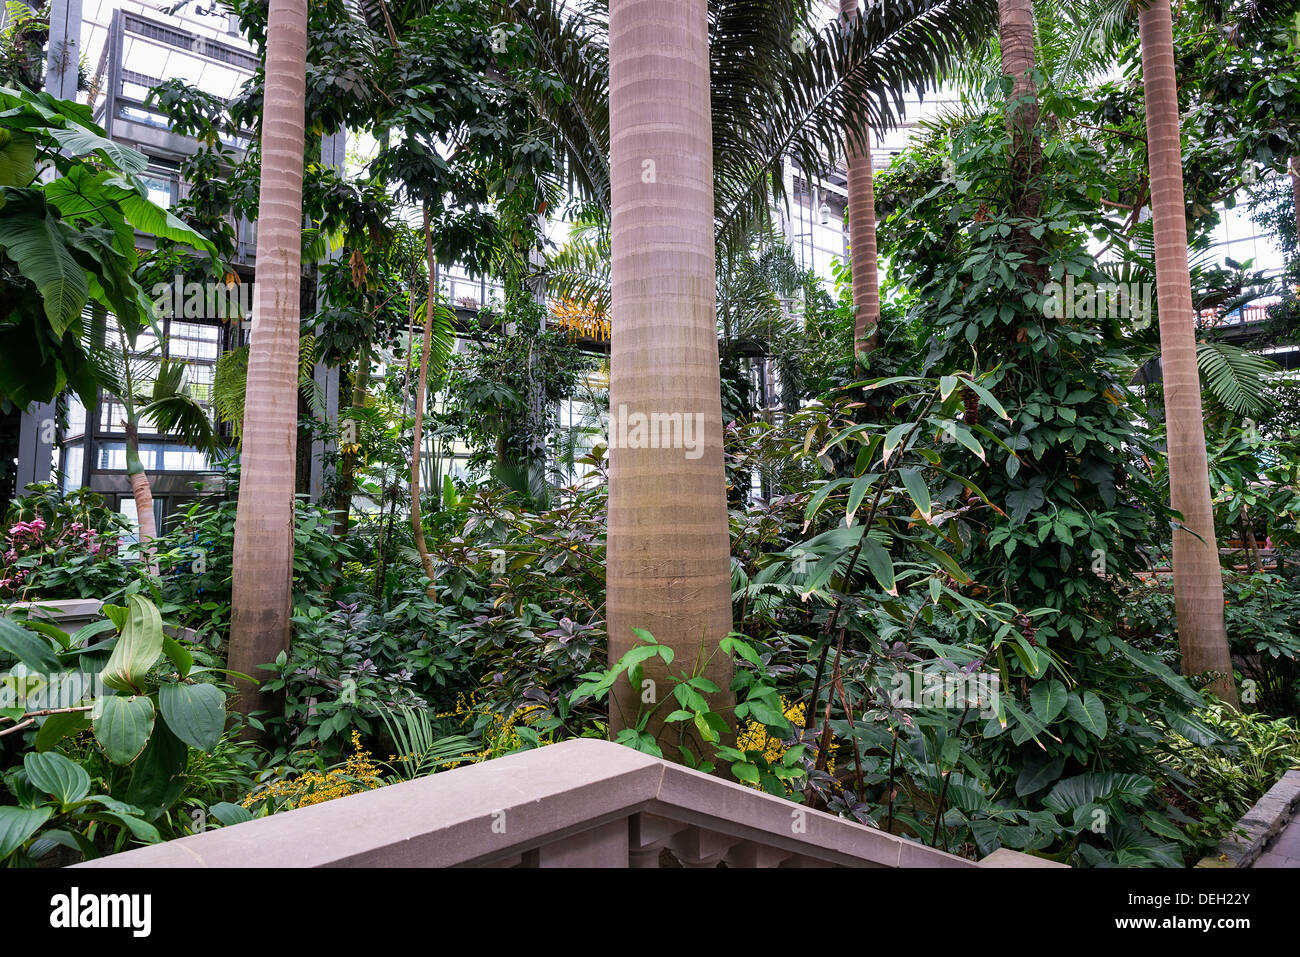 greenhouse interior us botanic garden washington dc usa stock image - Botanical Garden Washington Dc